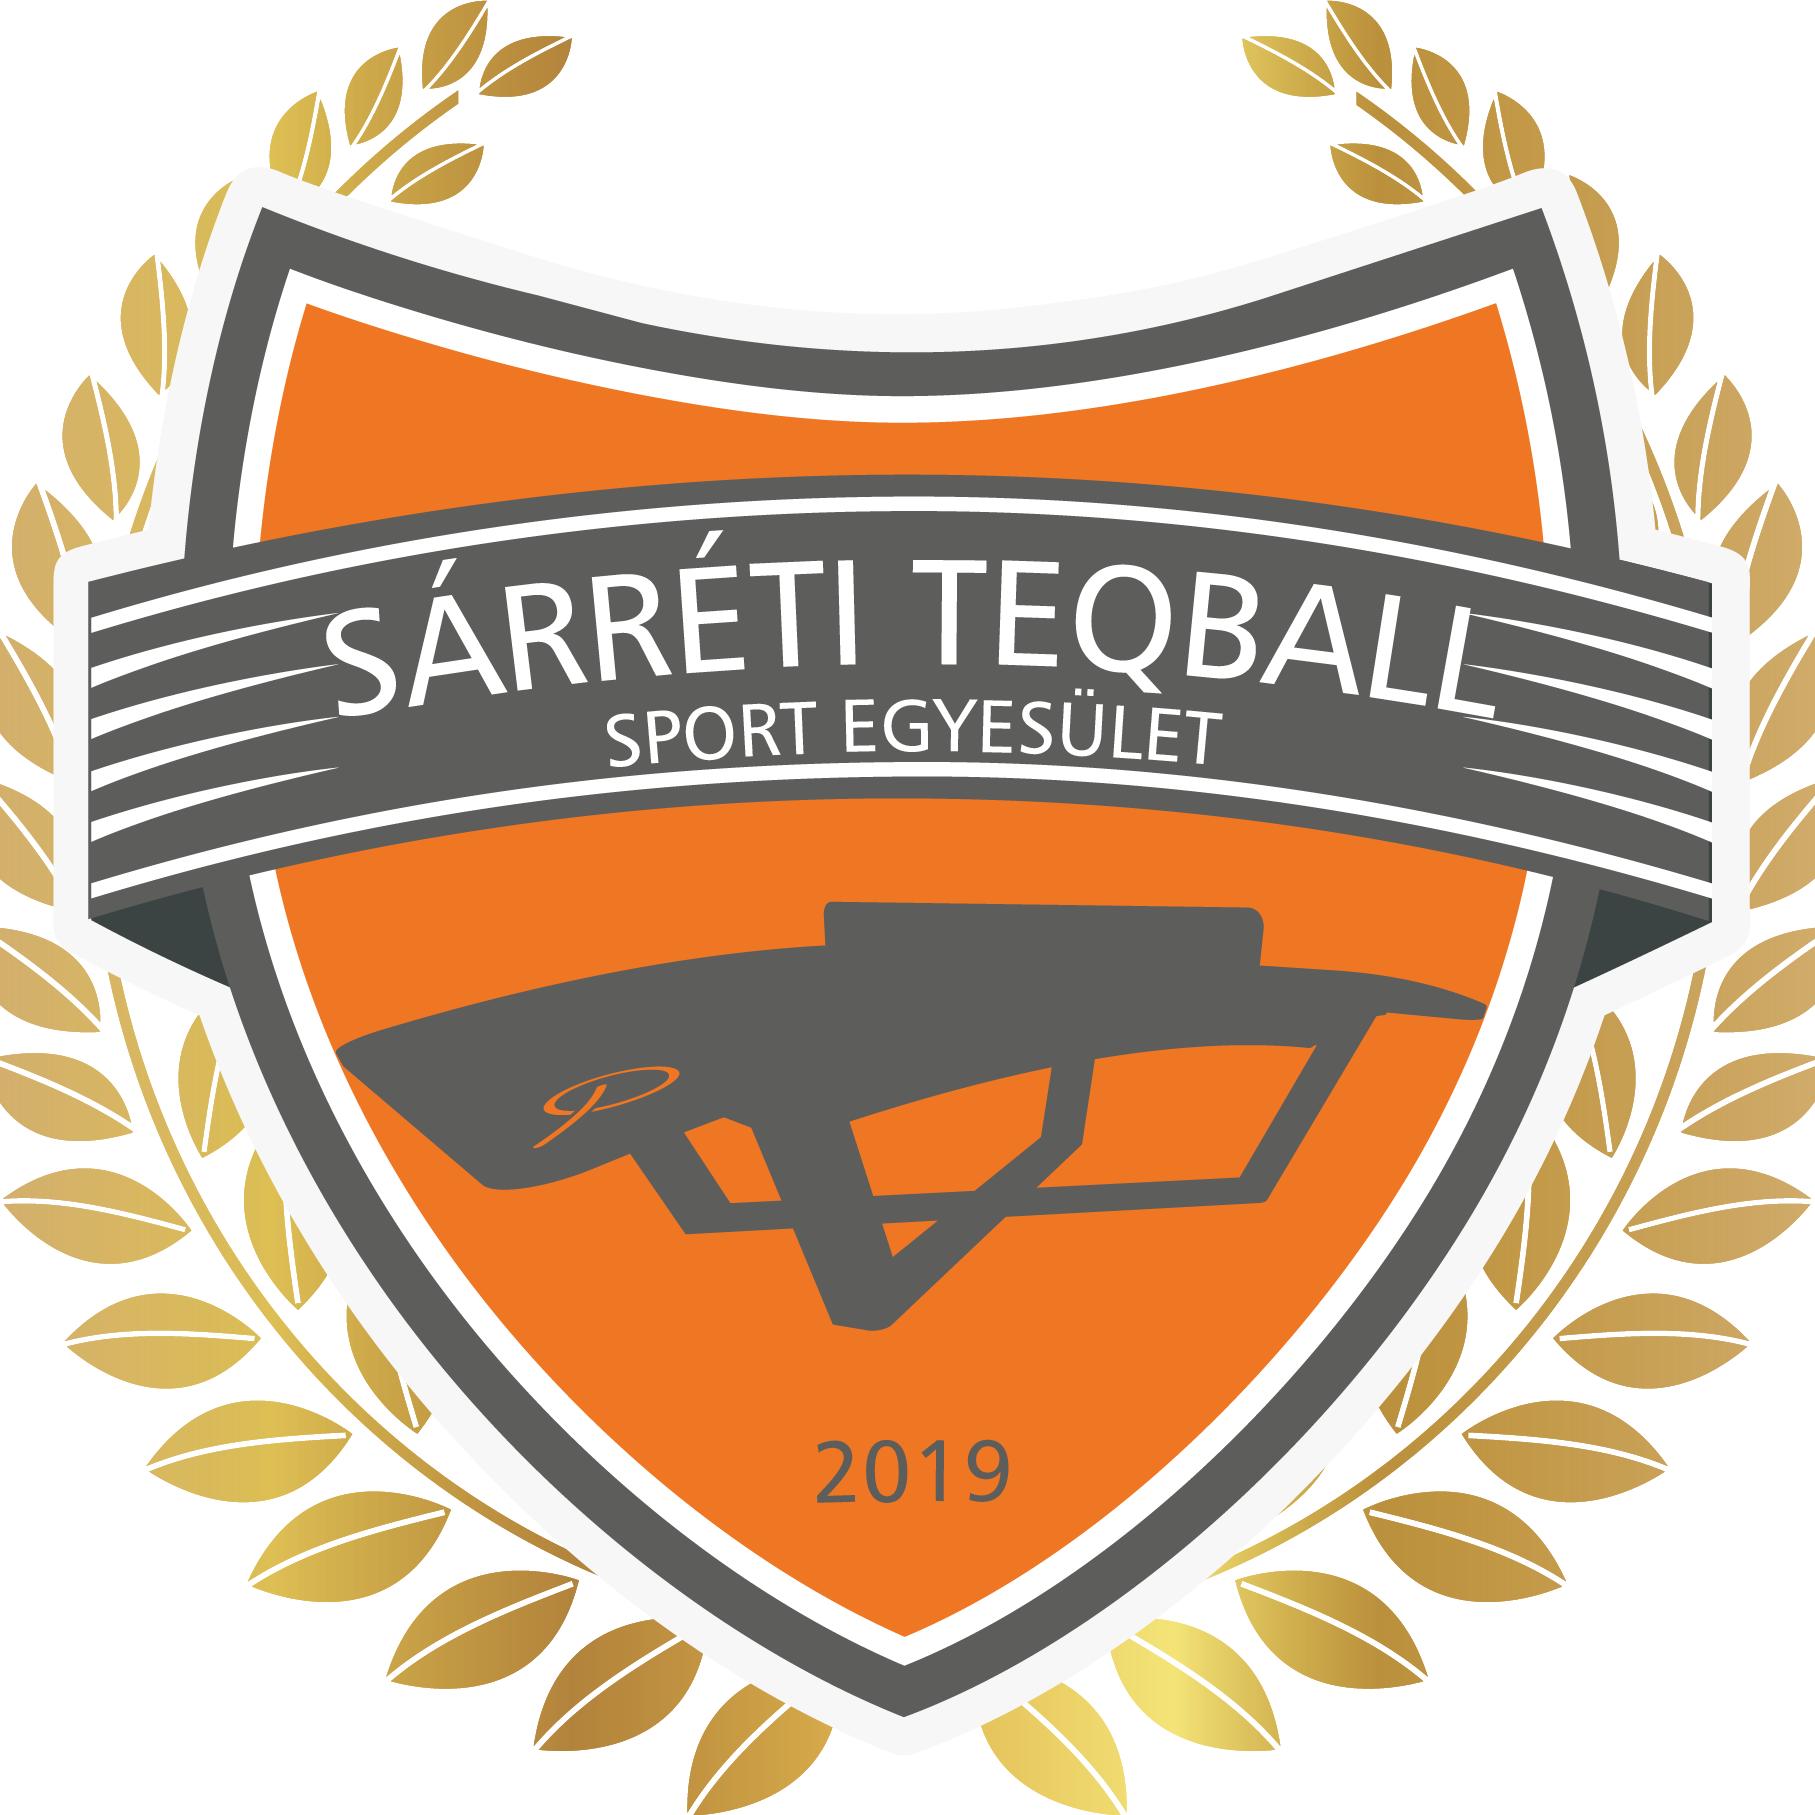 Sárréti Teqball SE